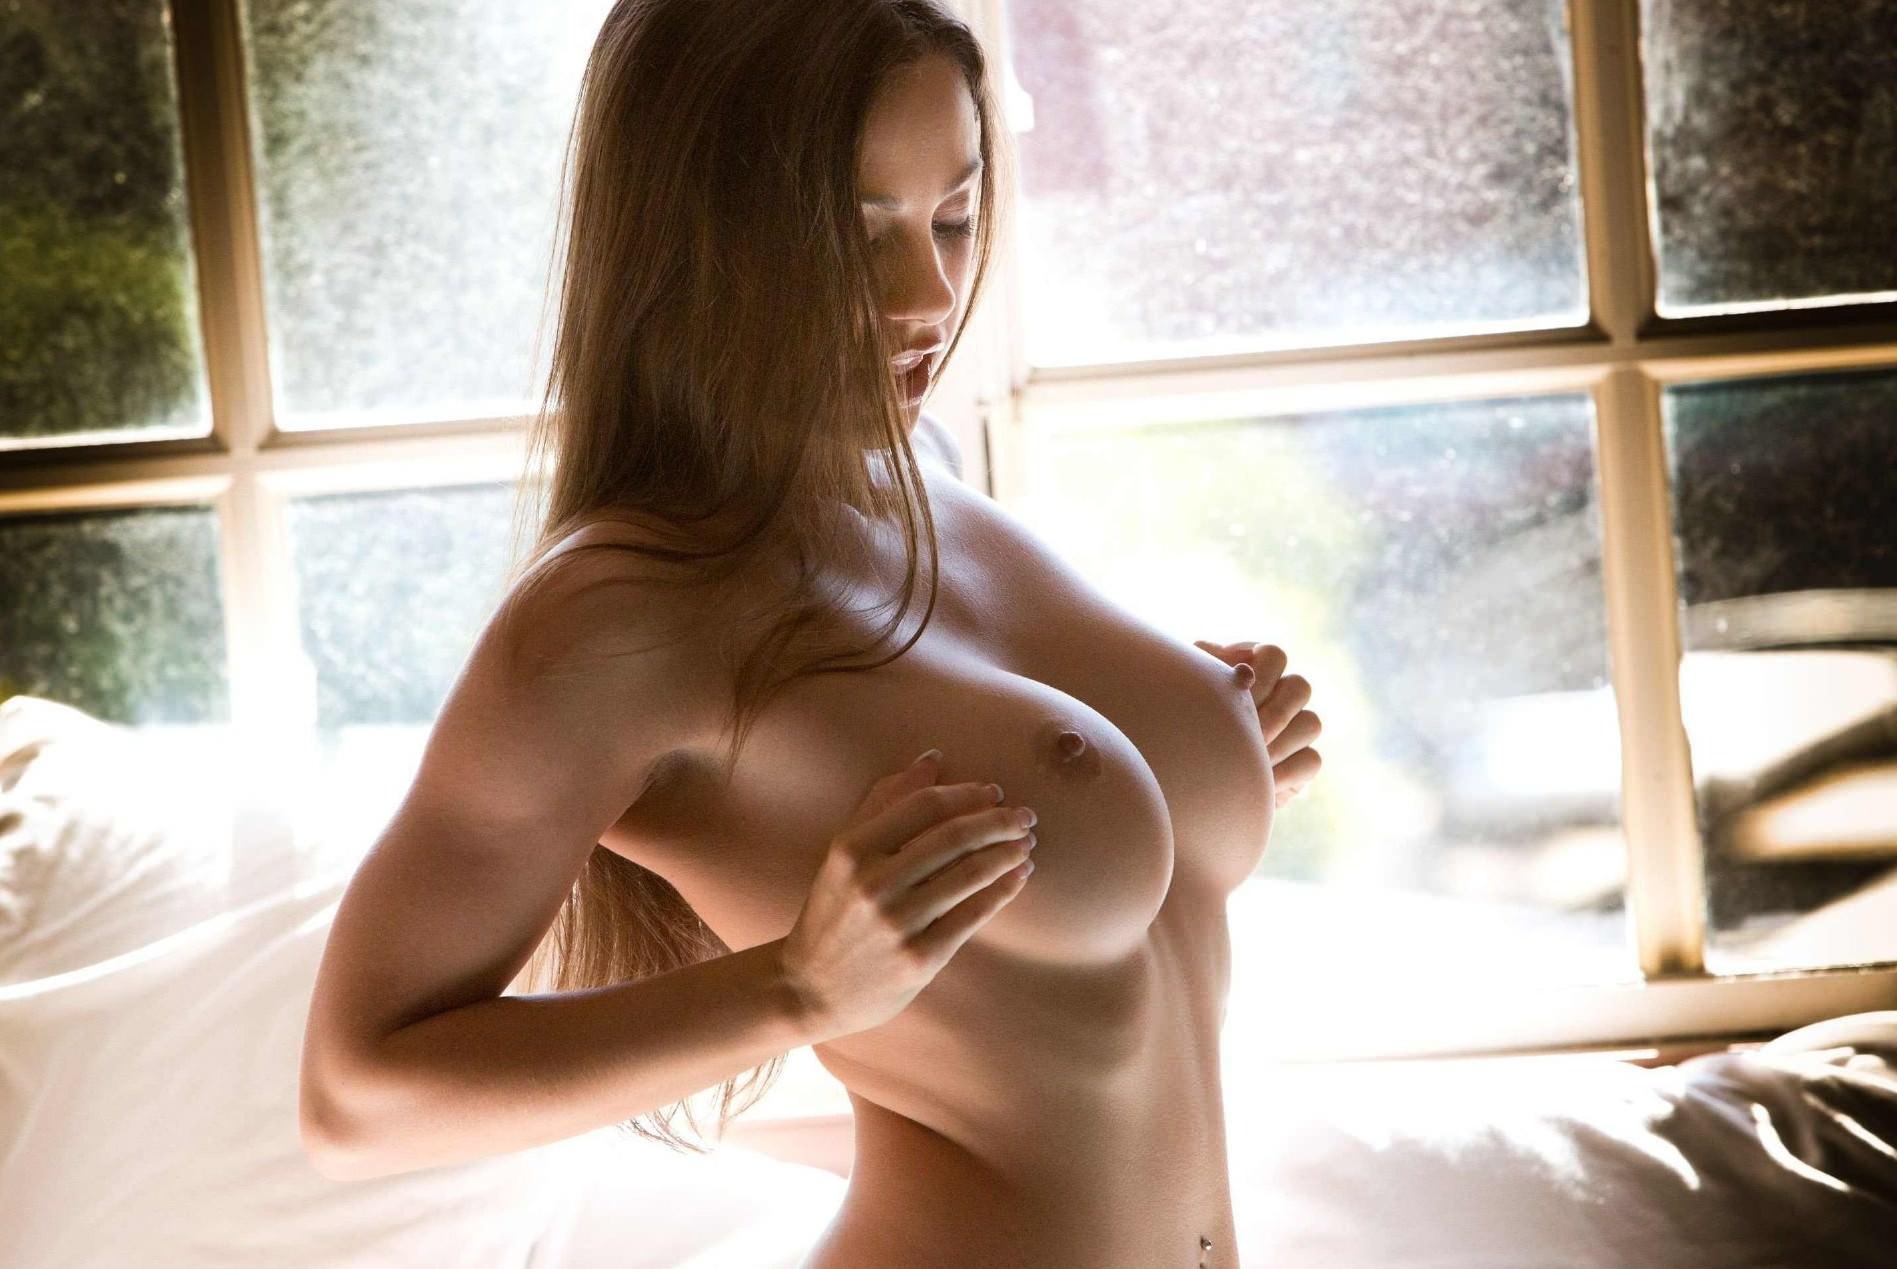 hot nude girl